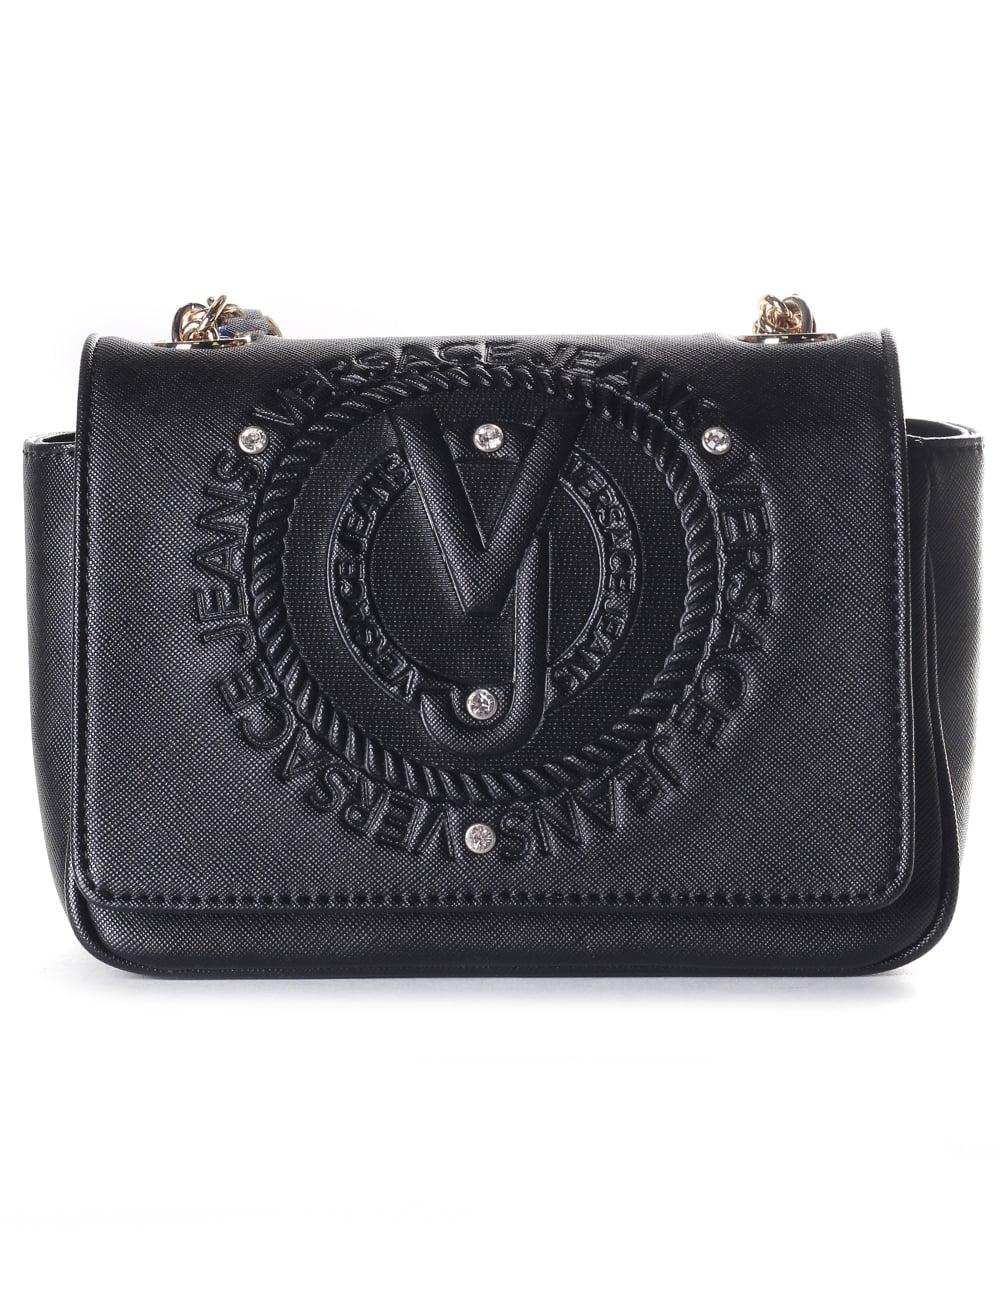 1866b7b1 Versace Jeans Embossed Logo Women's Chain Strap Bag